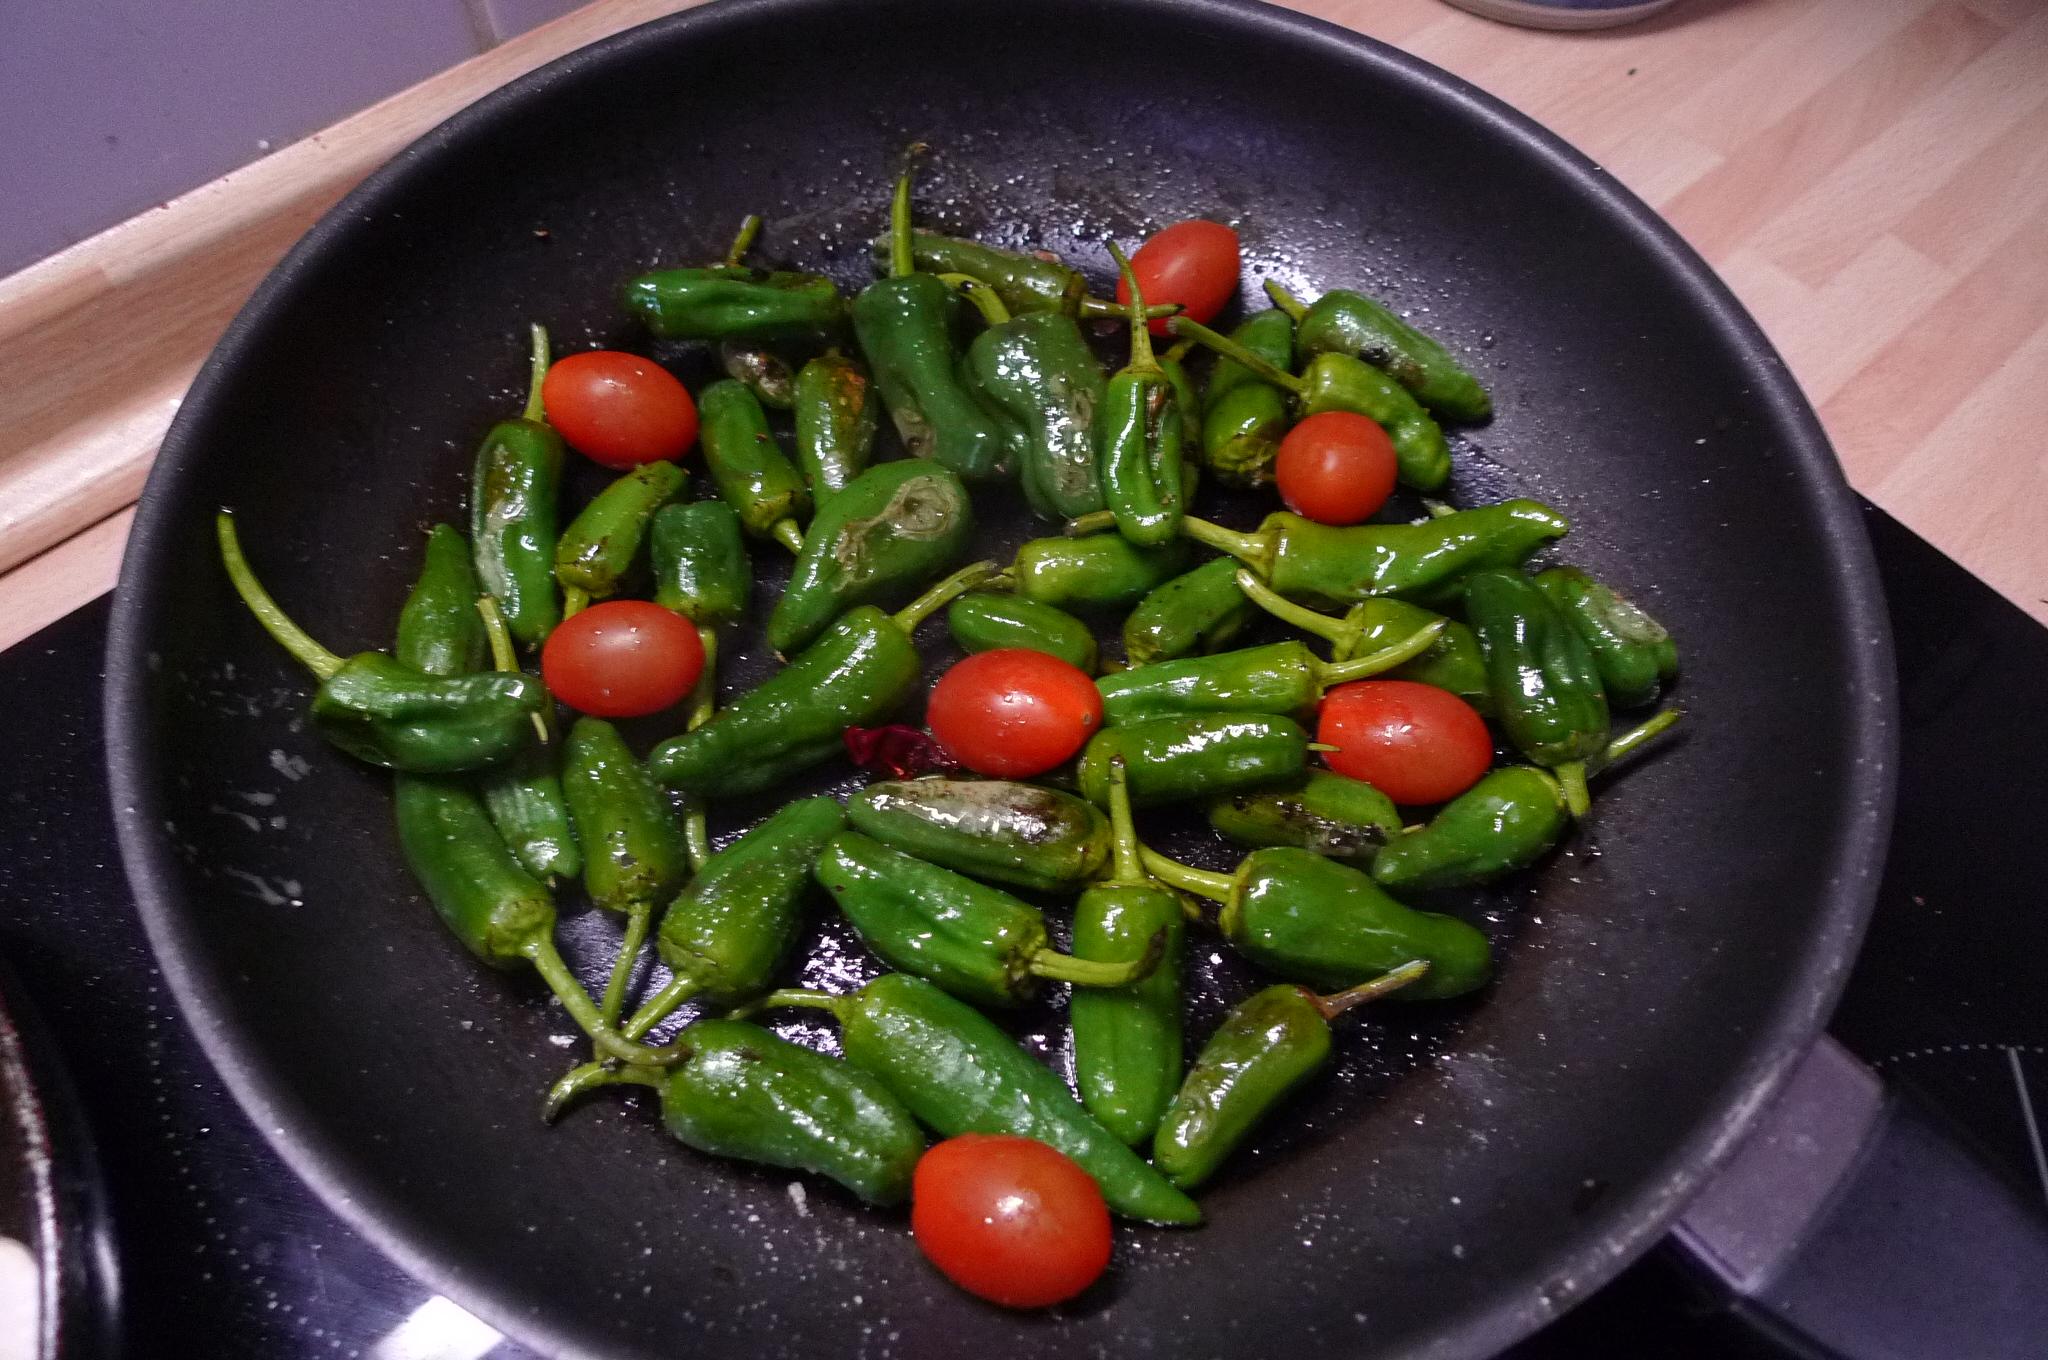 Grüne Nudeln,Ruccolapesto,Pilze,Bratpaprika,Salat-8.3.15   (5)